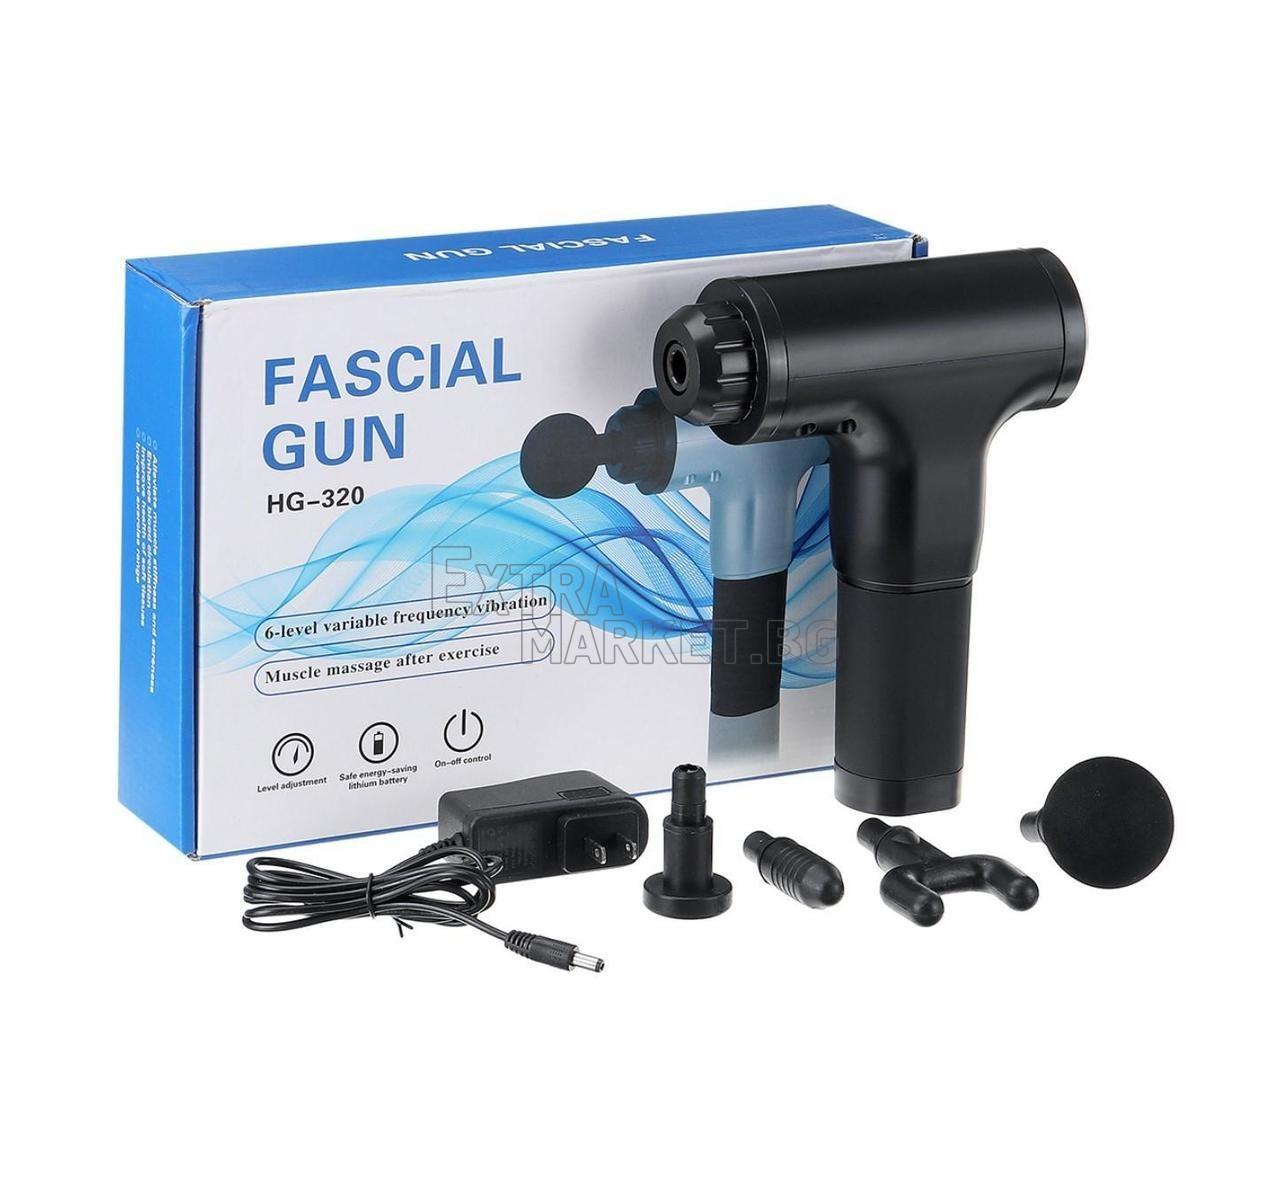 Мускулeн масажор-пистолет Fascial Gun HG-320